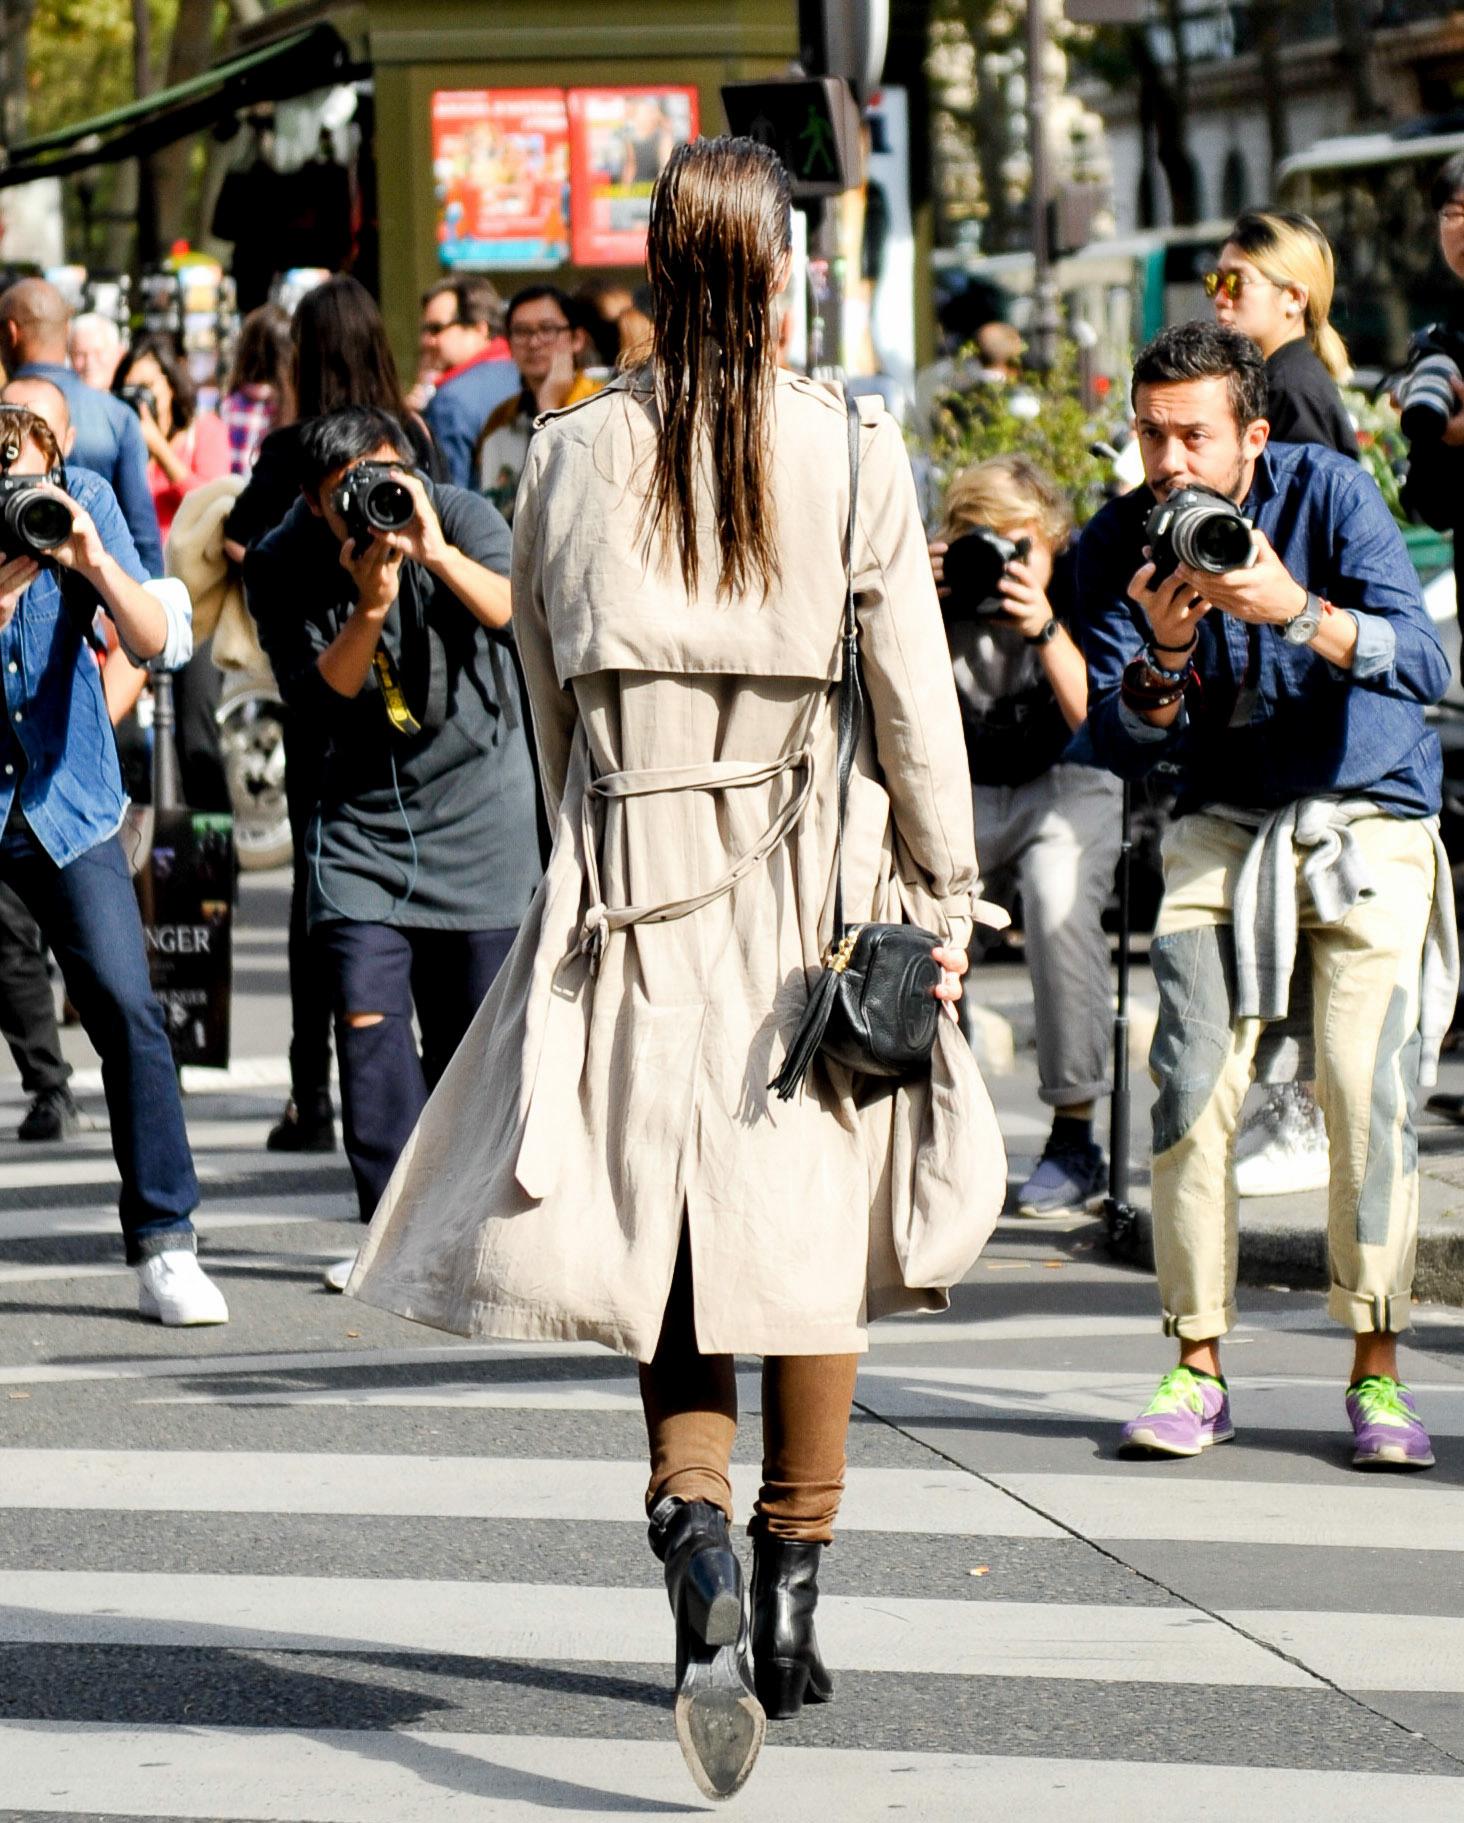 StreetStyle_ParisFashionWeek_LeandroJusten_066.jpg